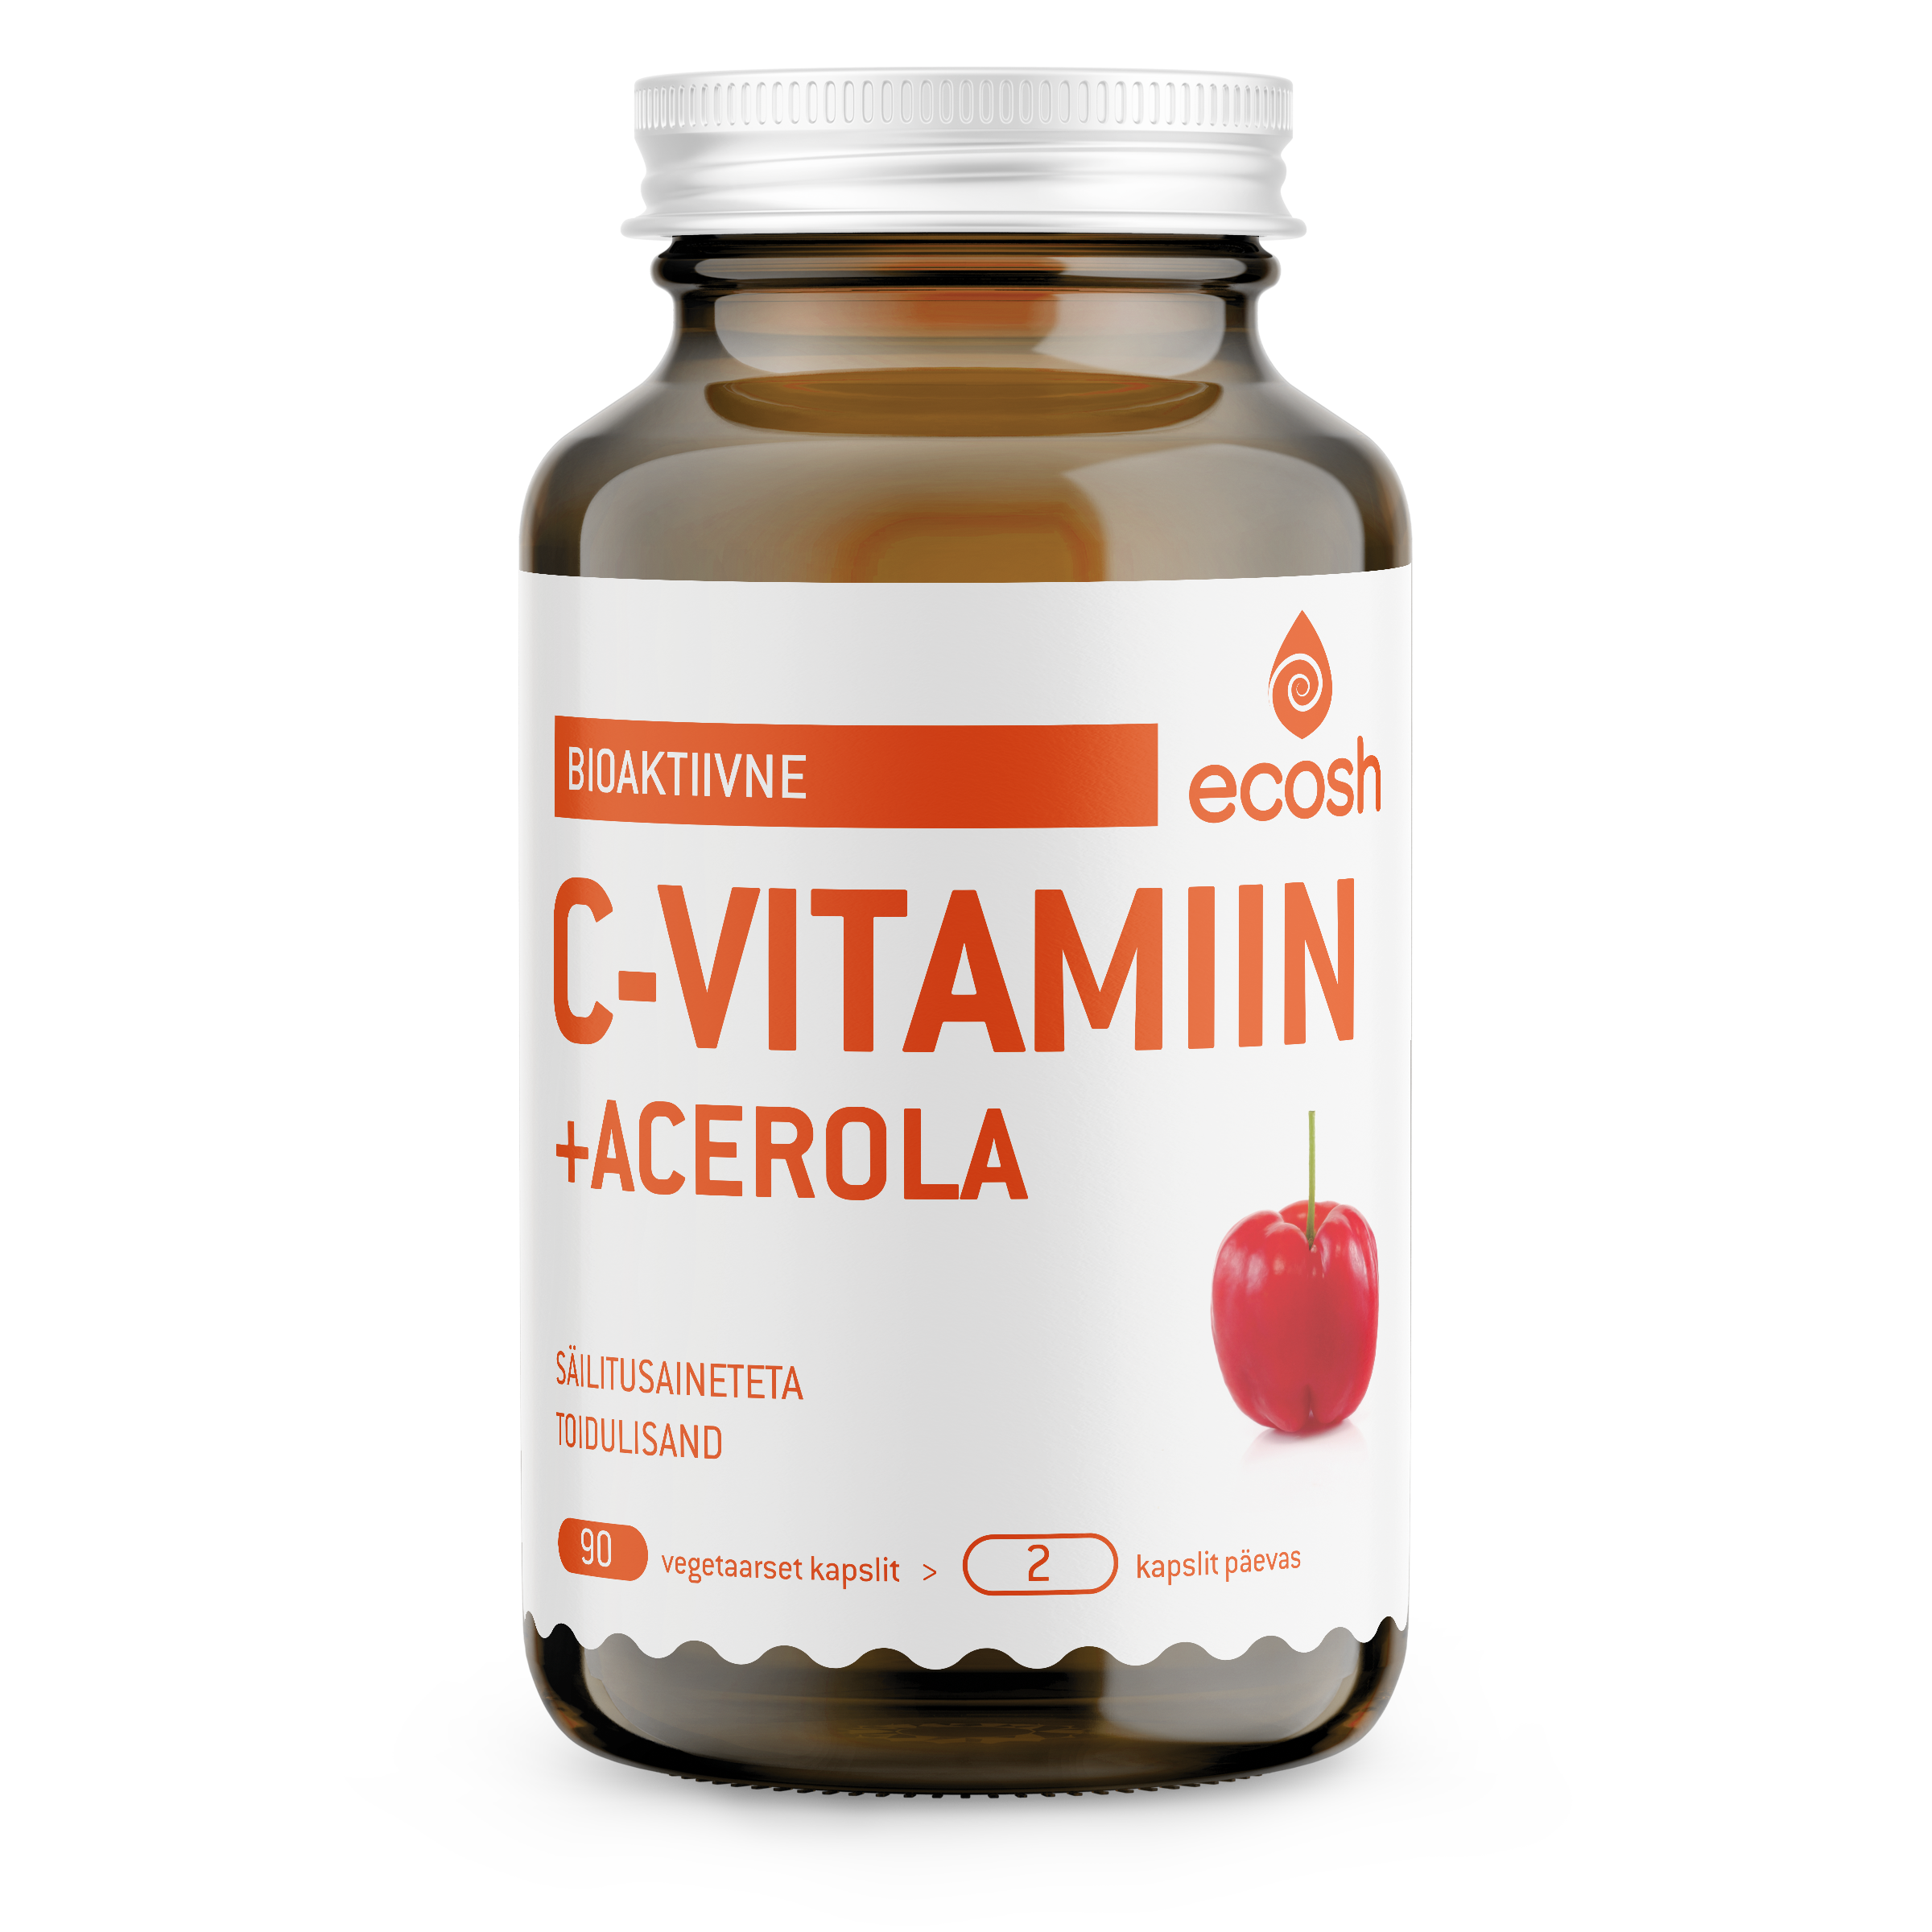 Bioaktiivne C-vitamiin Acerolaga